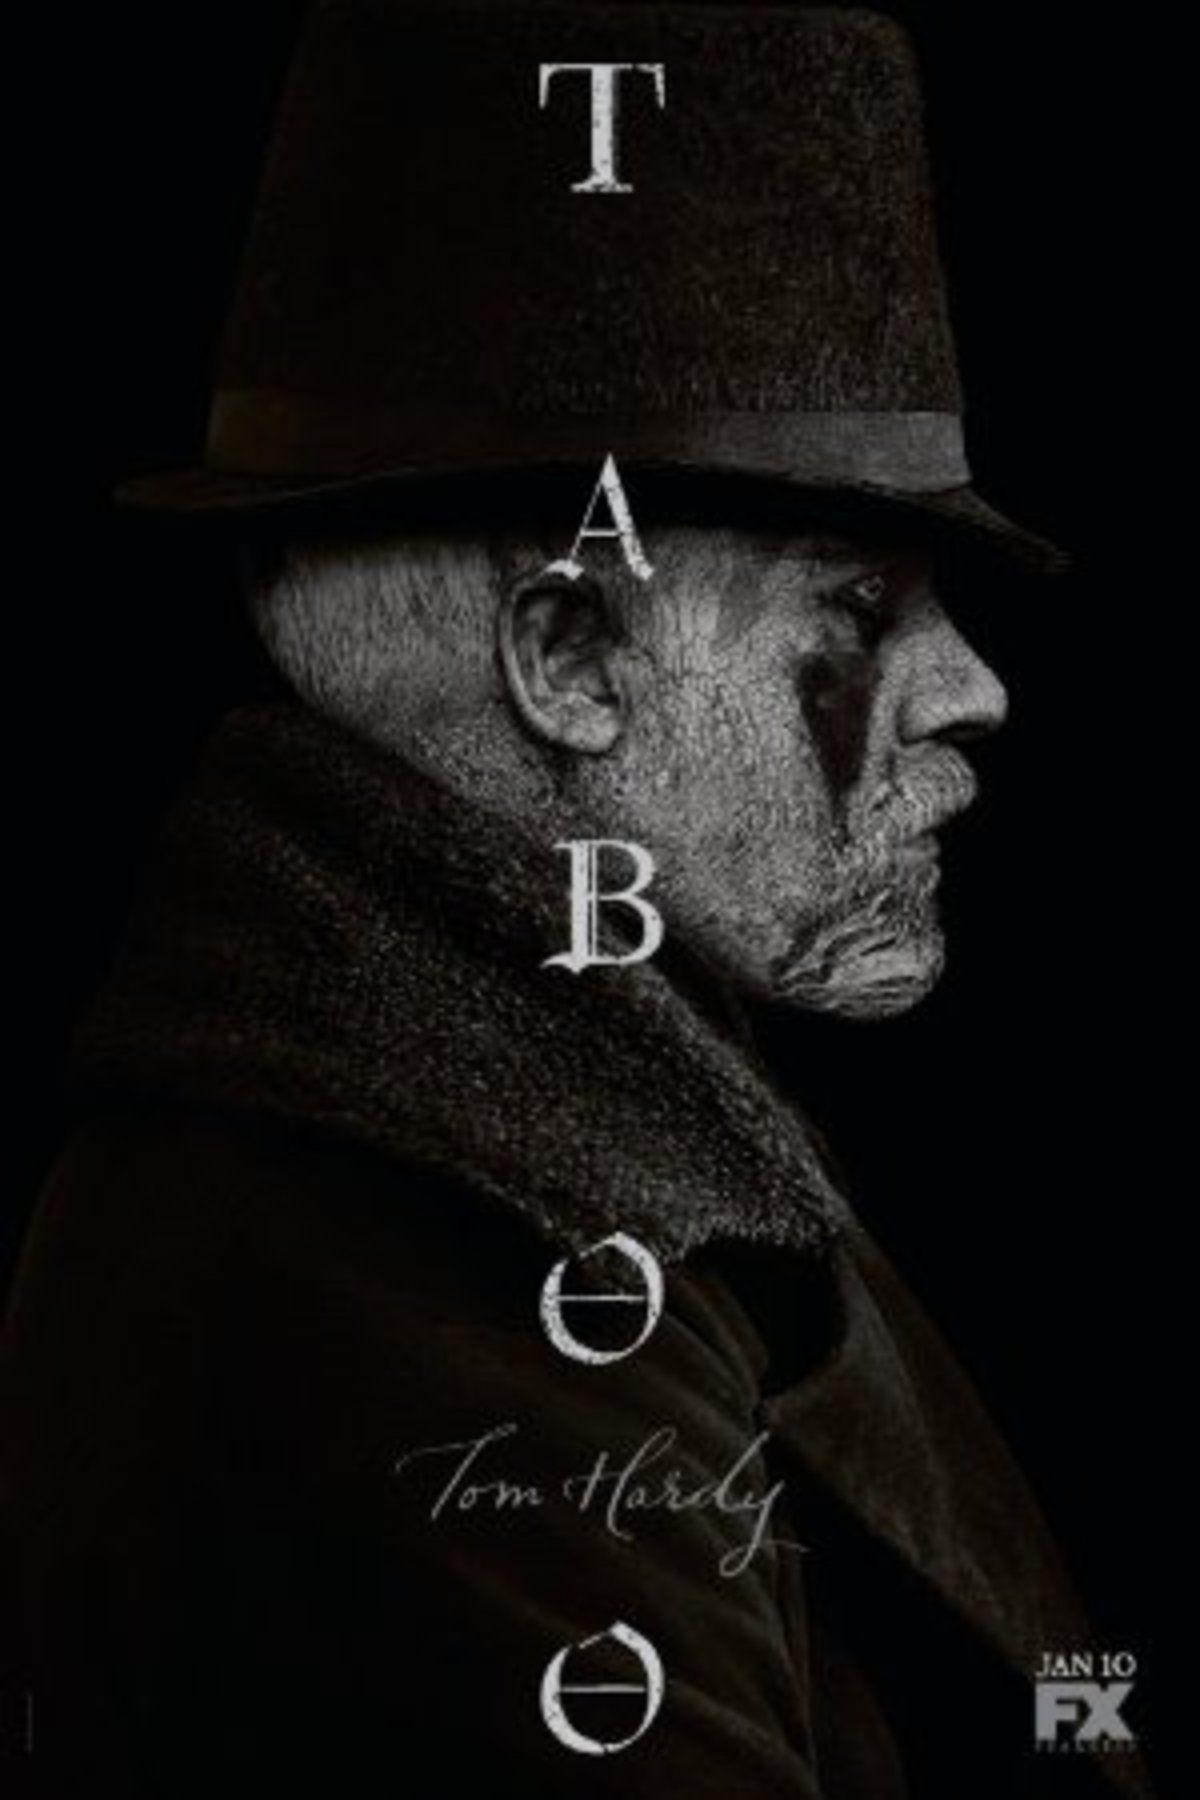 download taboo season 1 ep 5 hd tv series | pinterest | movie sites